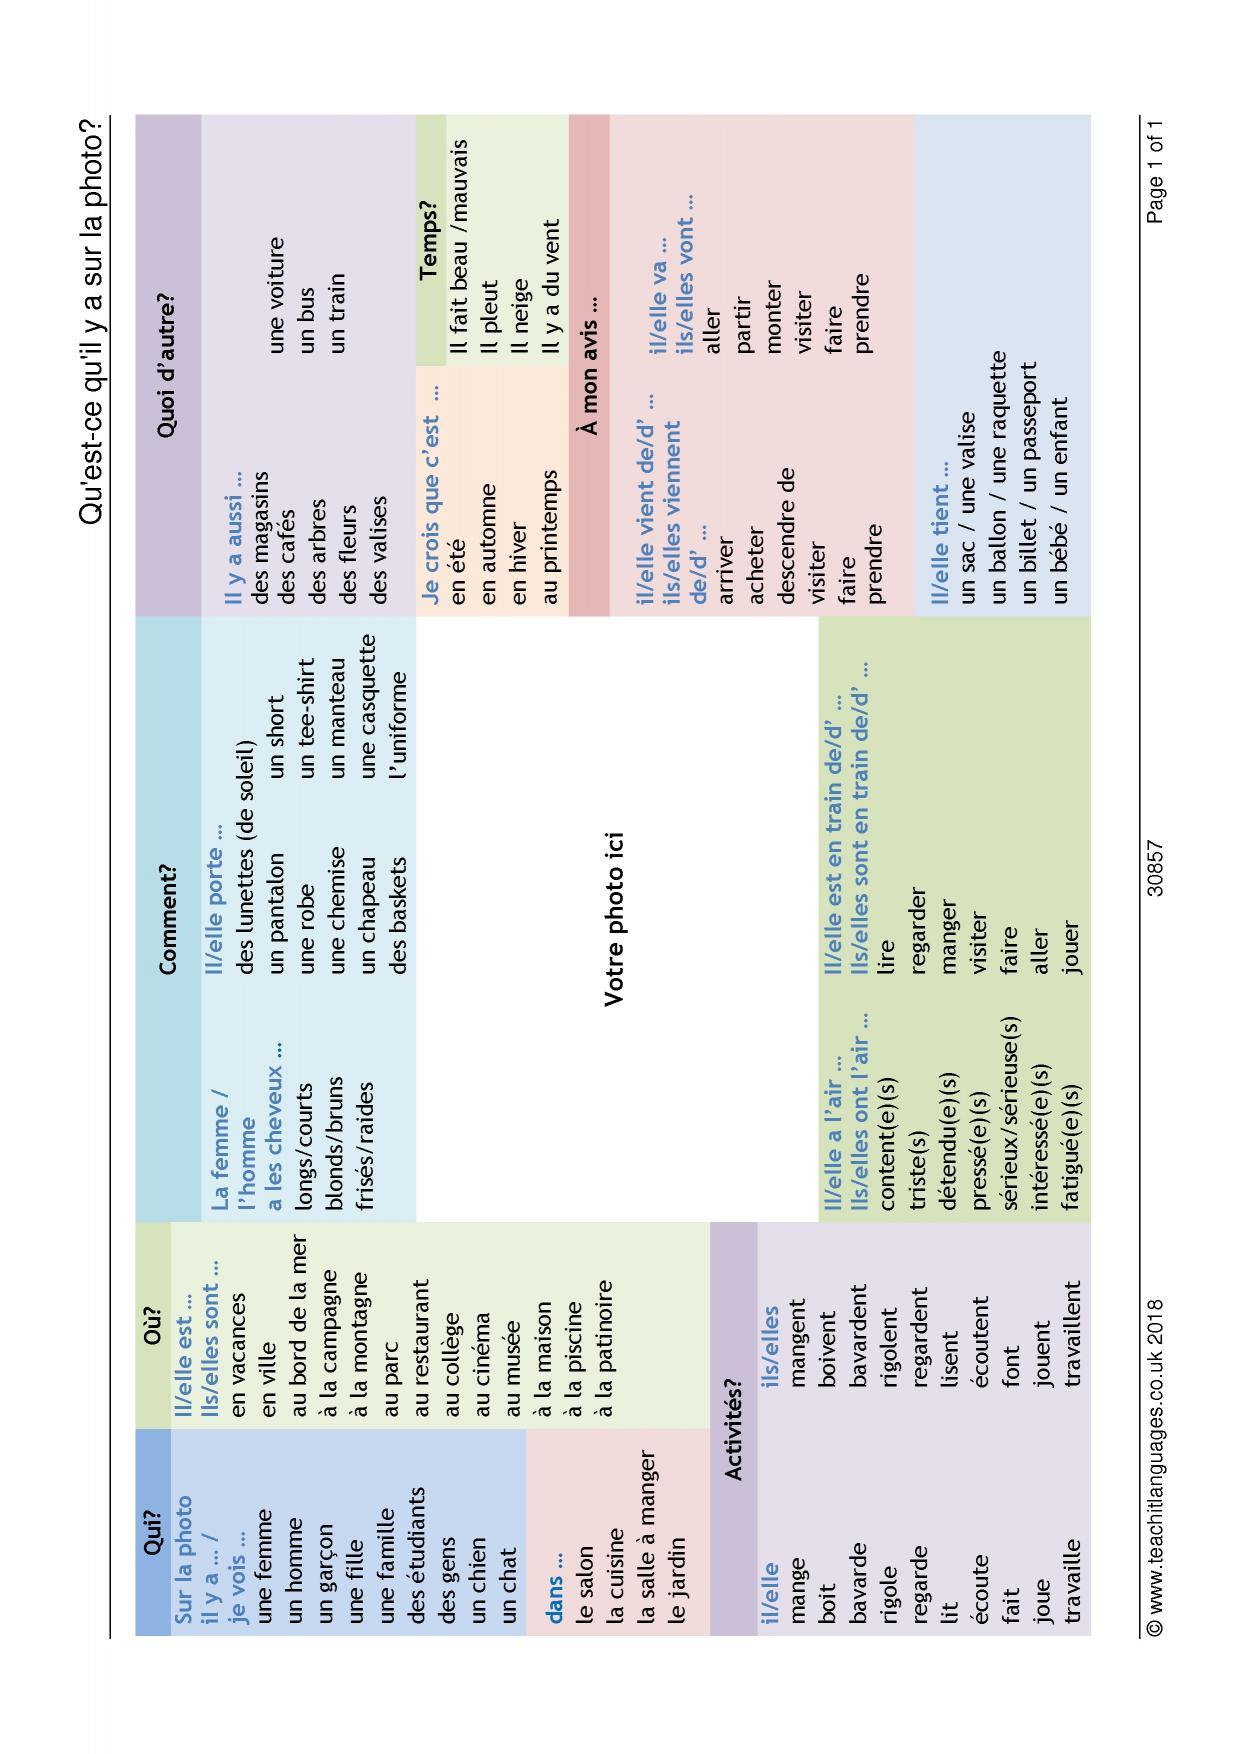 7202d589b3 French language teaching resources | TeachIt Languages - Teachit ...